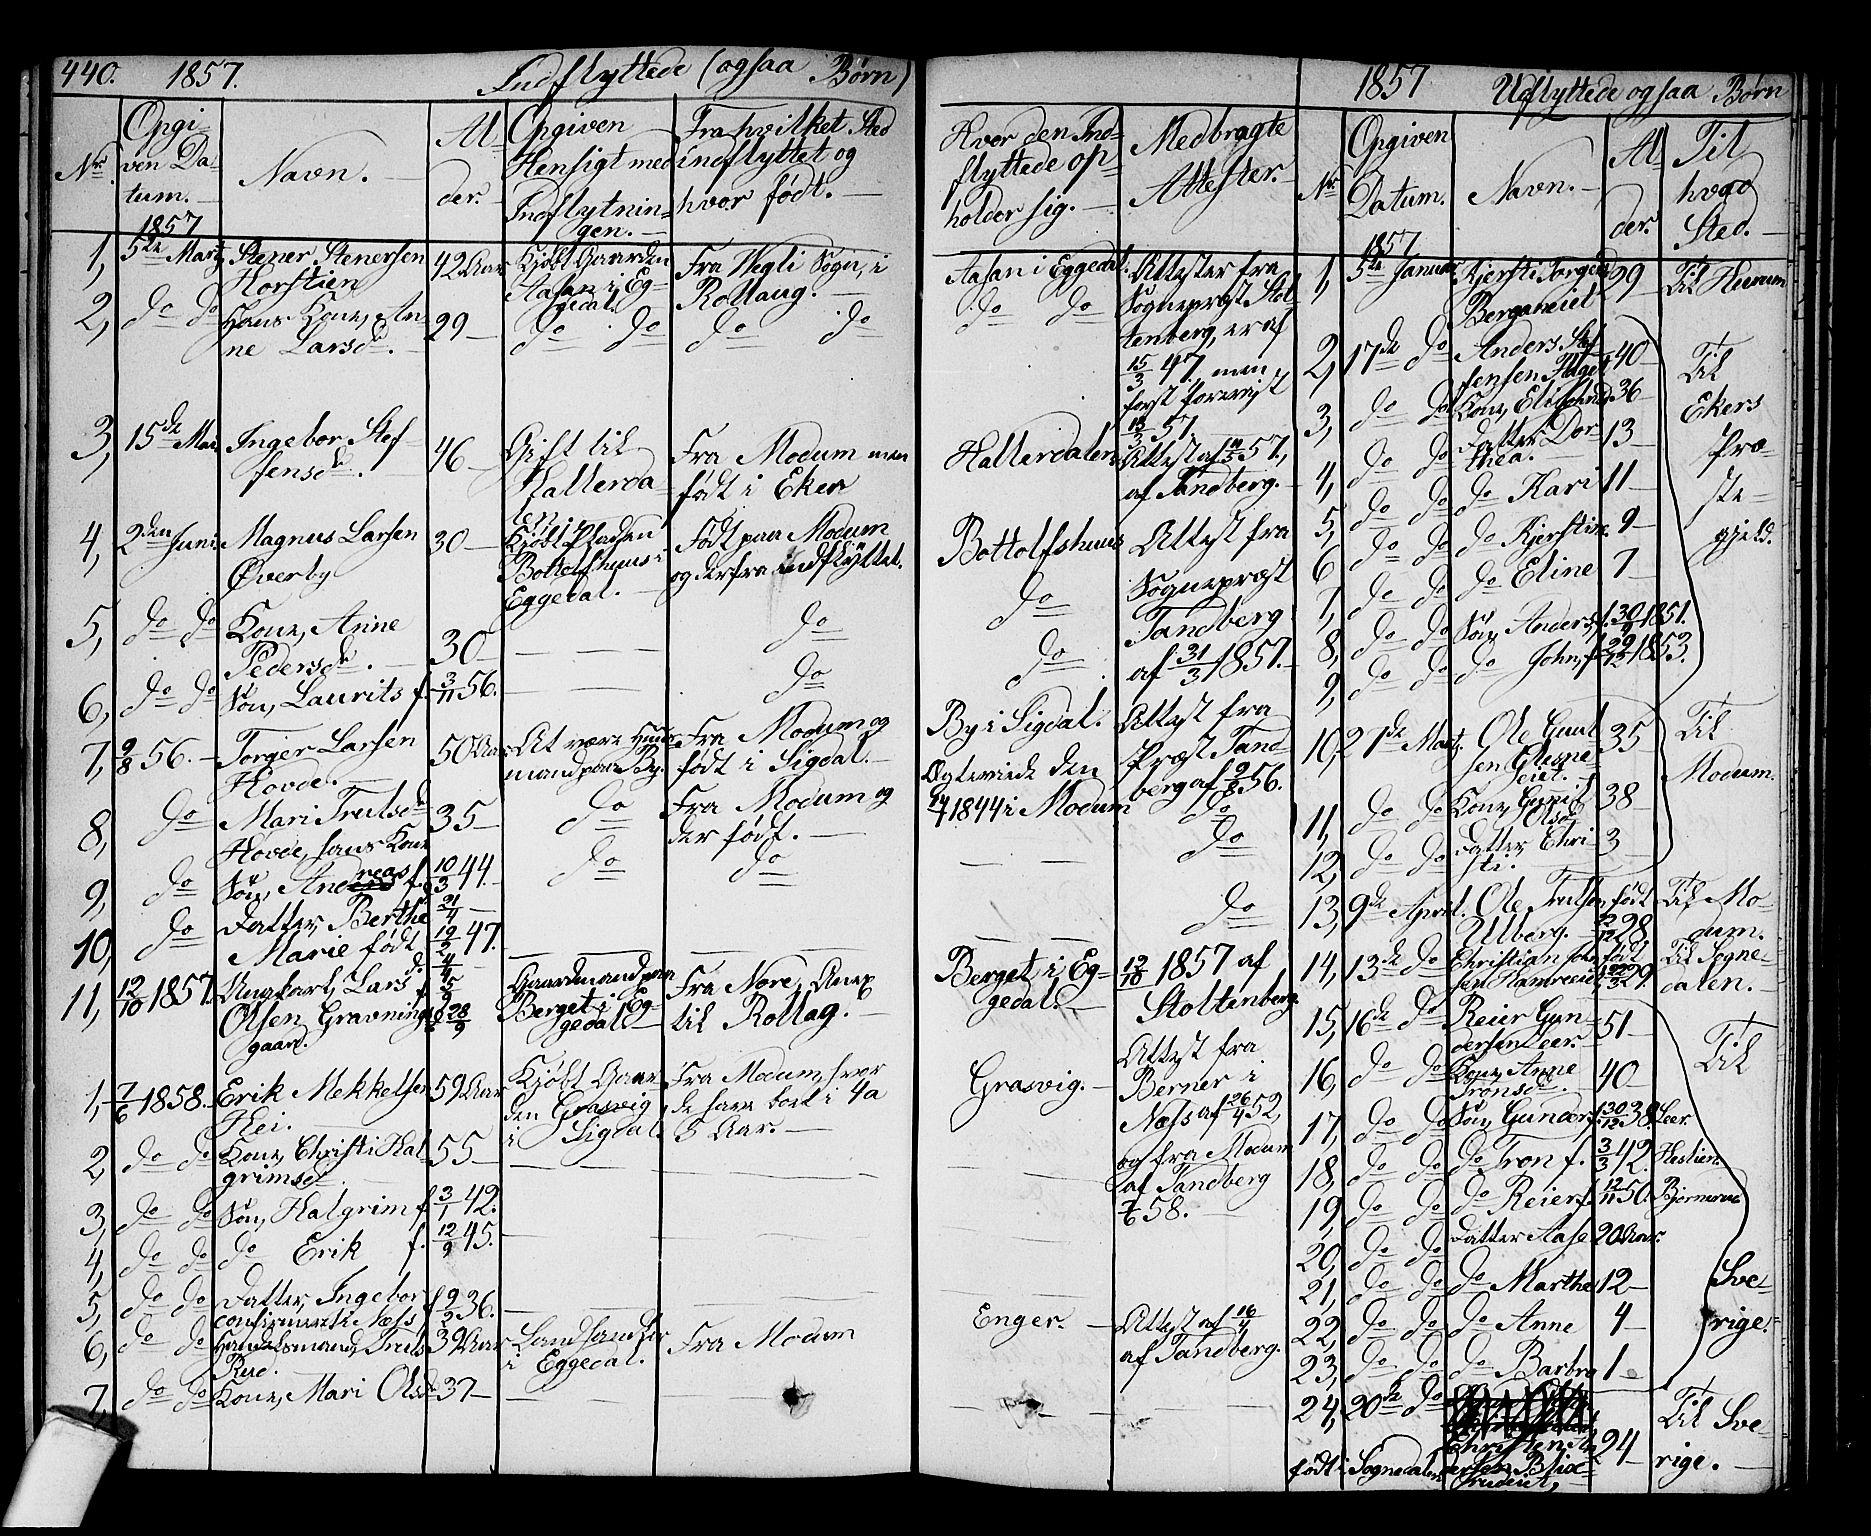 SAKO, Sigdal kirkebøker, G/Ga/L0003: Klokkerbok nr. I 3, 1857-1878, s. 440